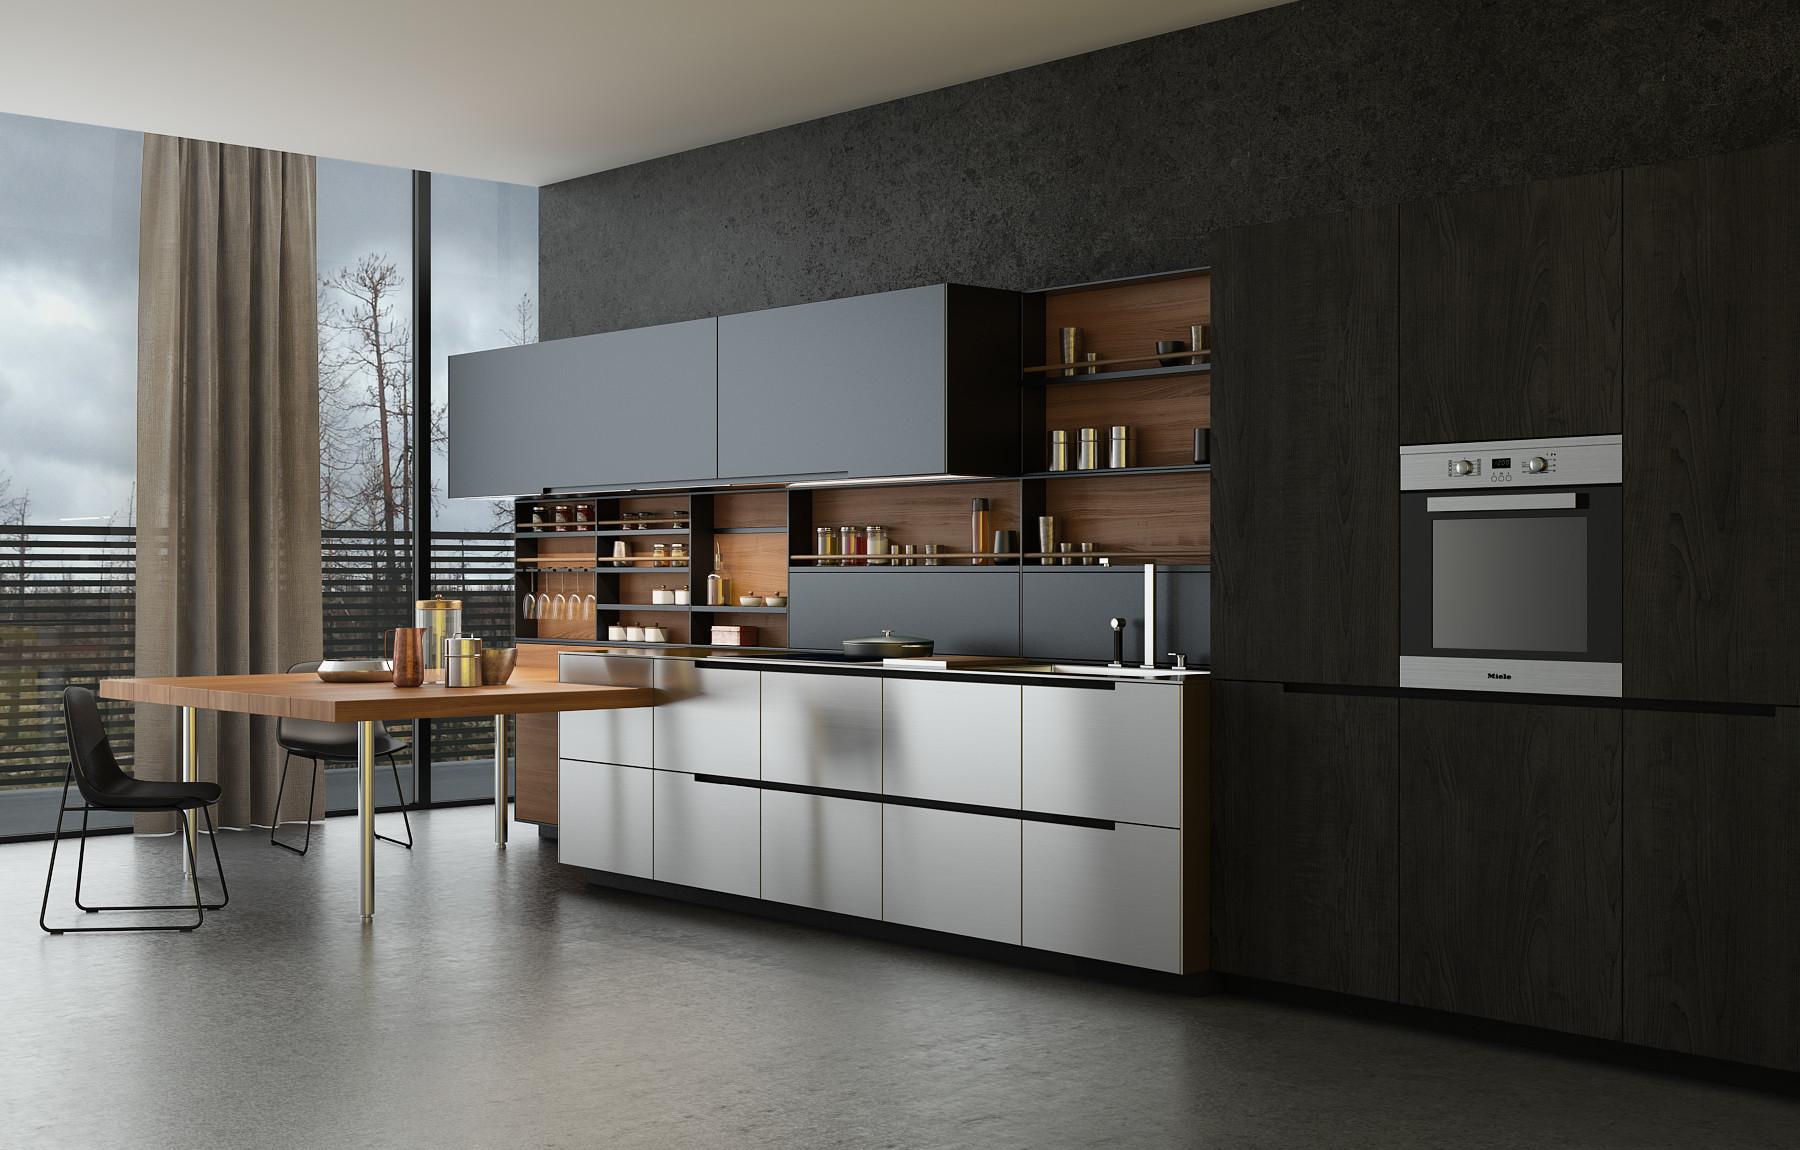 3dad_int_poli kitchen_02.jpg